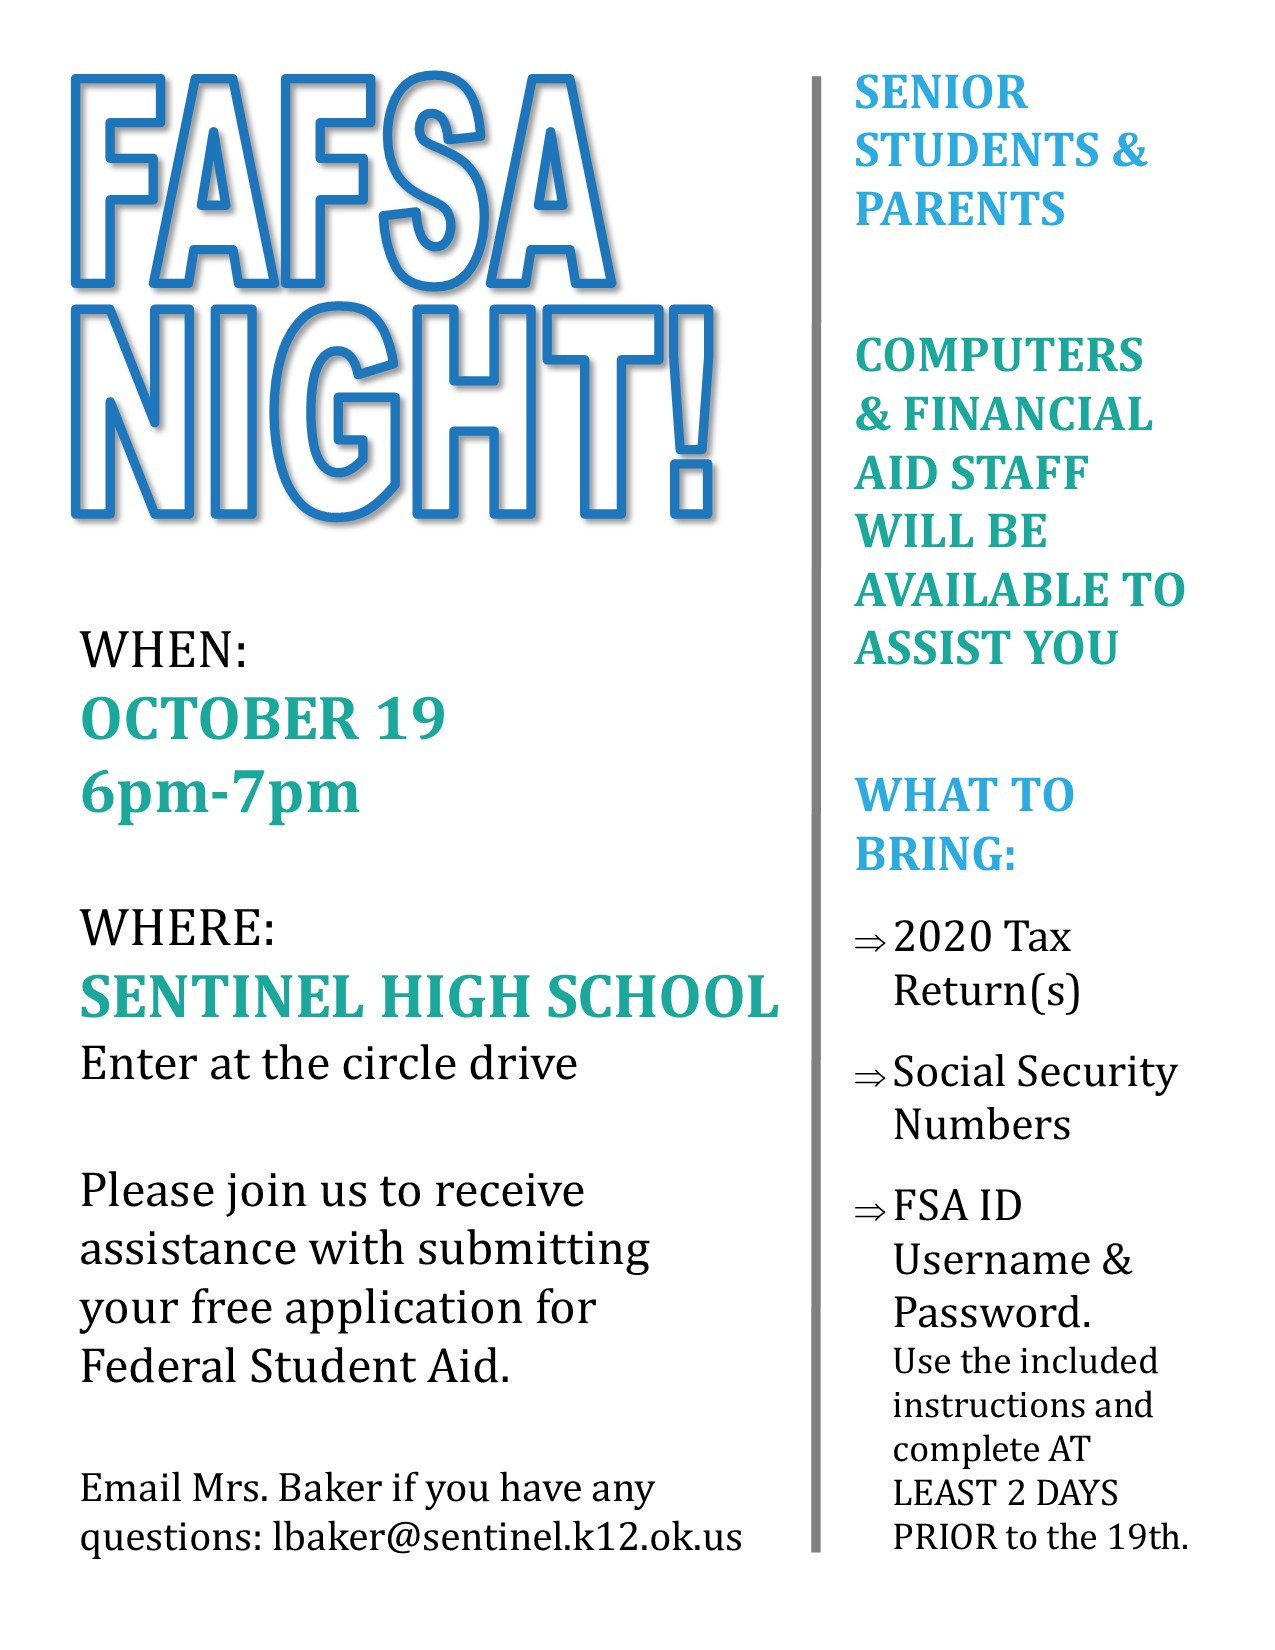 FAFSA Night Flyer